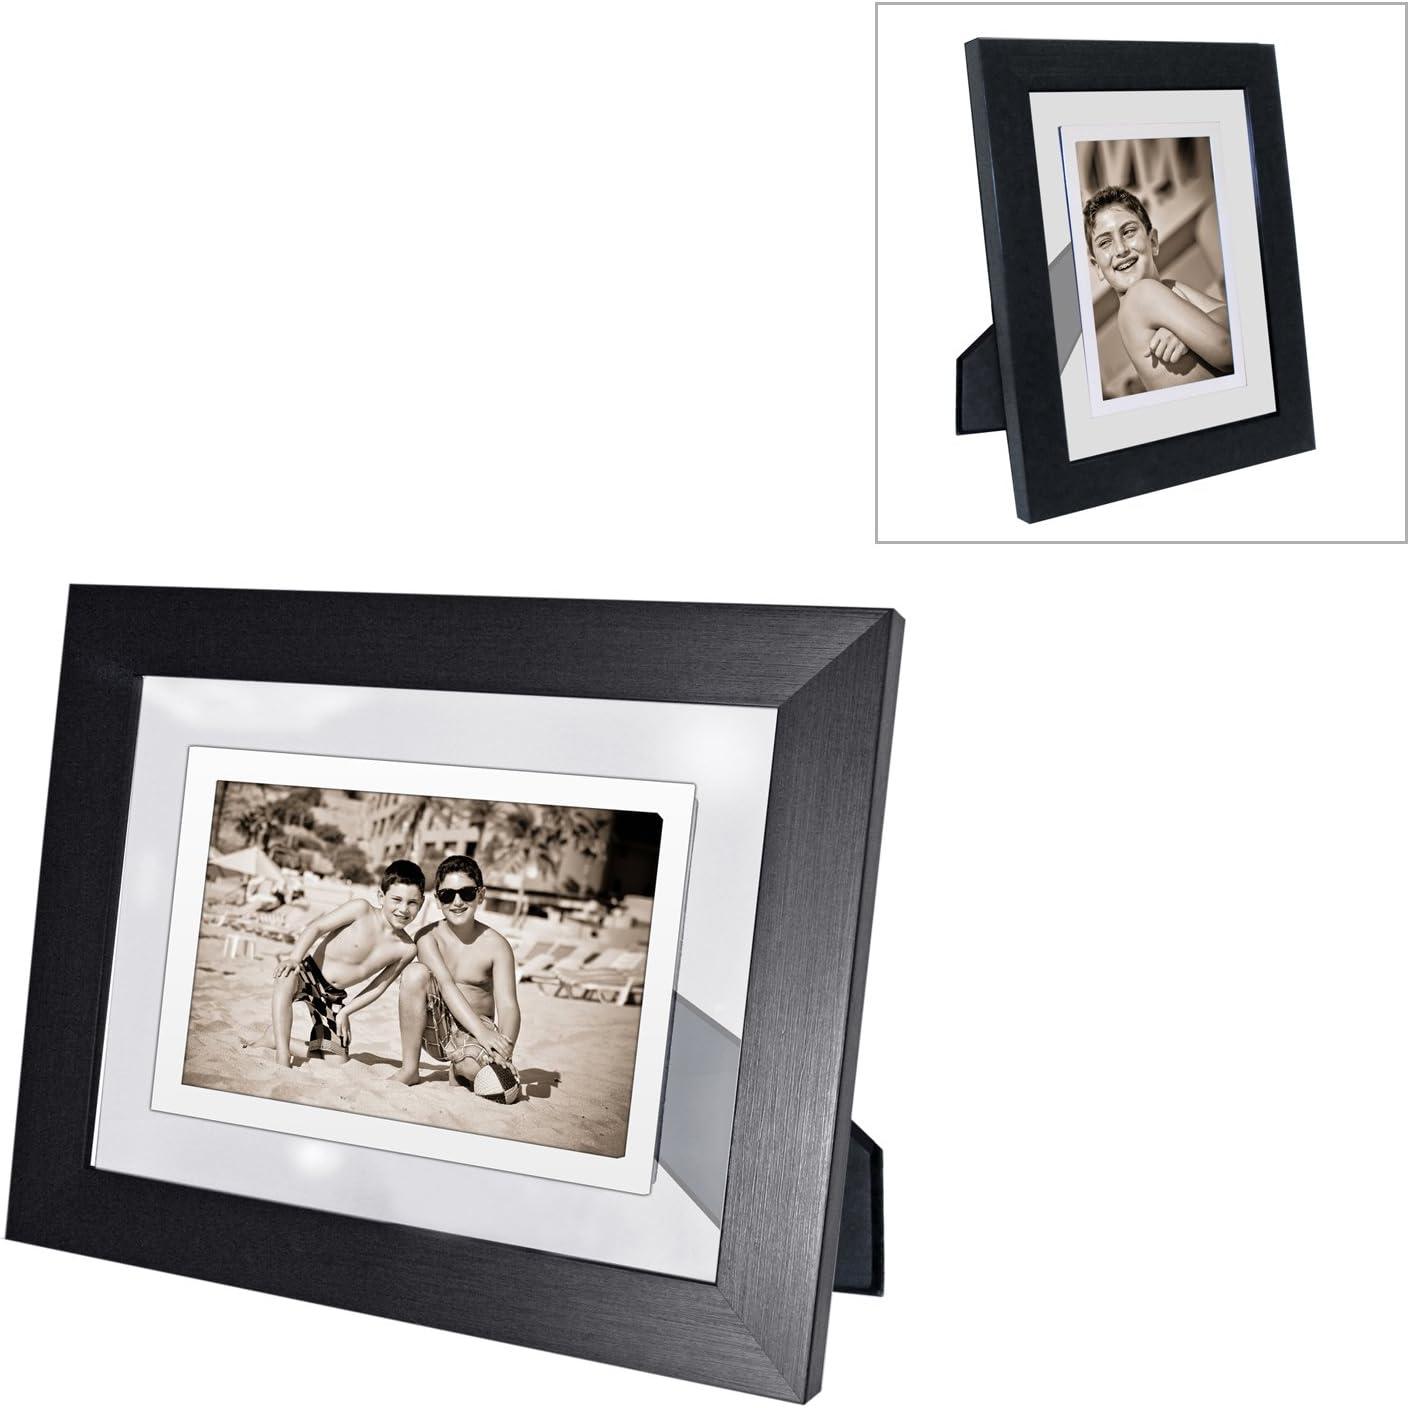 Picture Frame 5 x 7inch Photo Farme Metal Photo